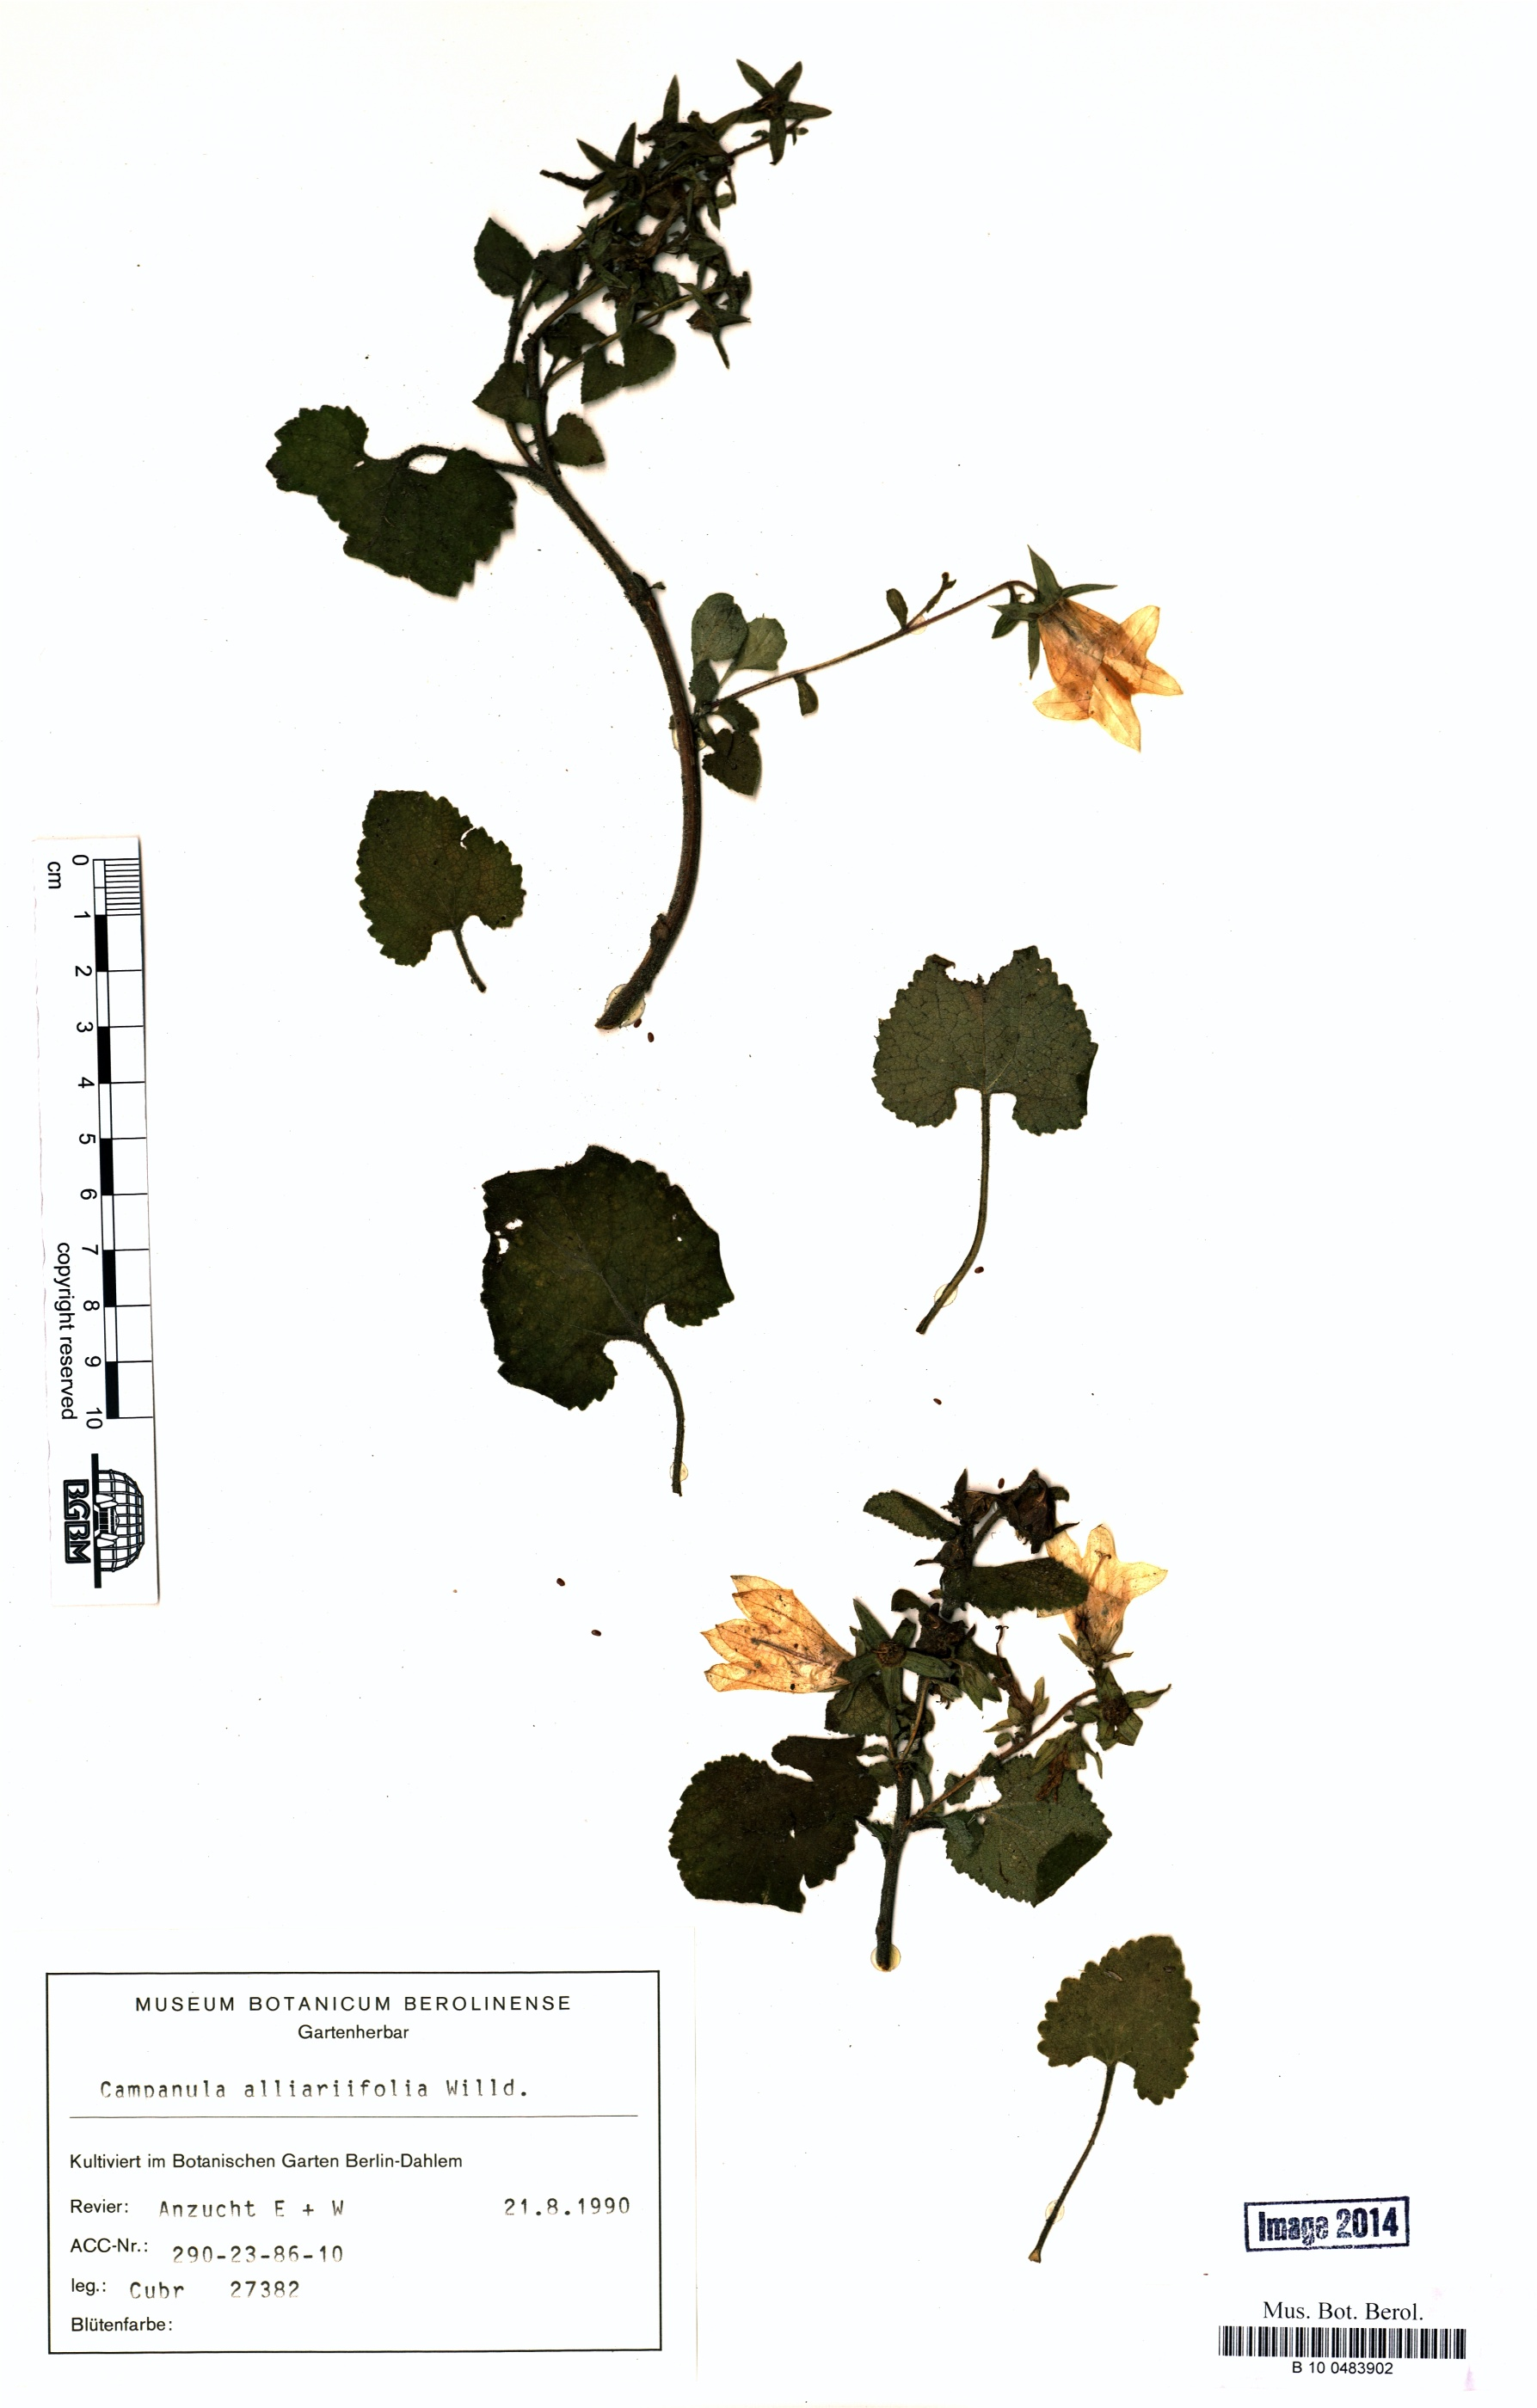 http://ww2.bgbm.org/herbarium/images/B/10/04/83/90/B_10_0483902.jpg